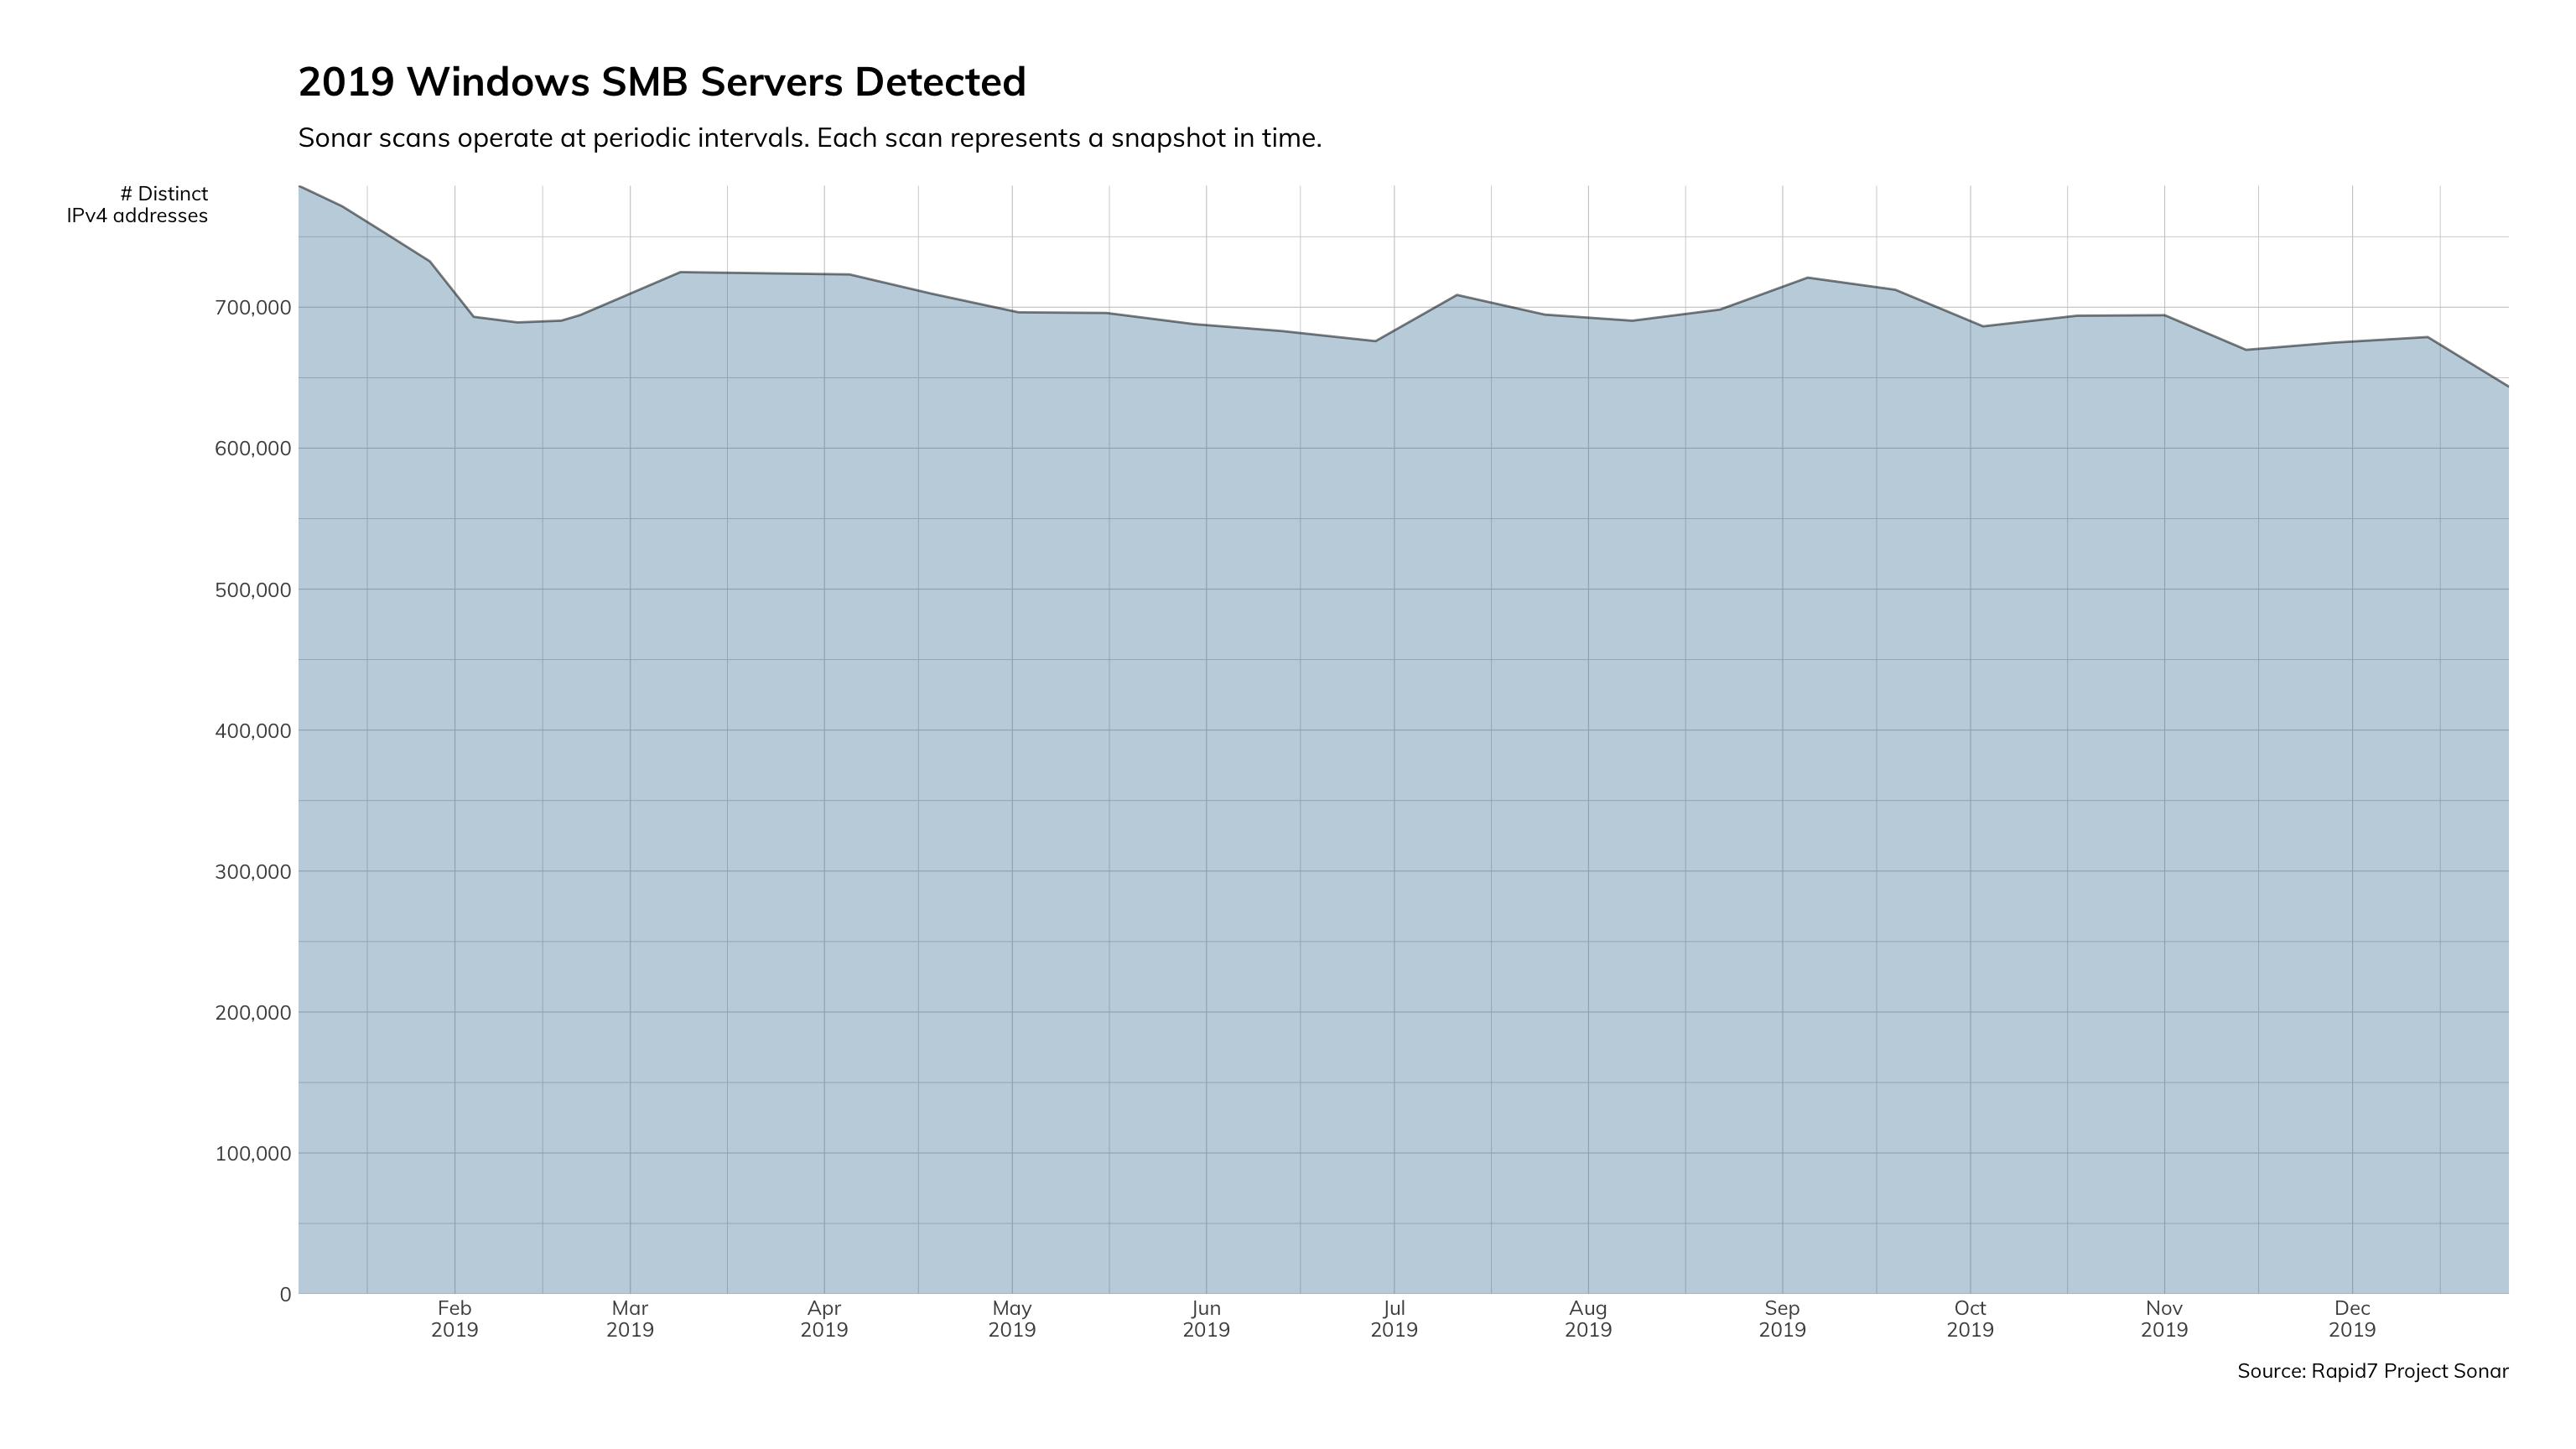 Figure 2: 2019 Windows SMB Servers Detected